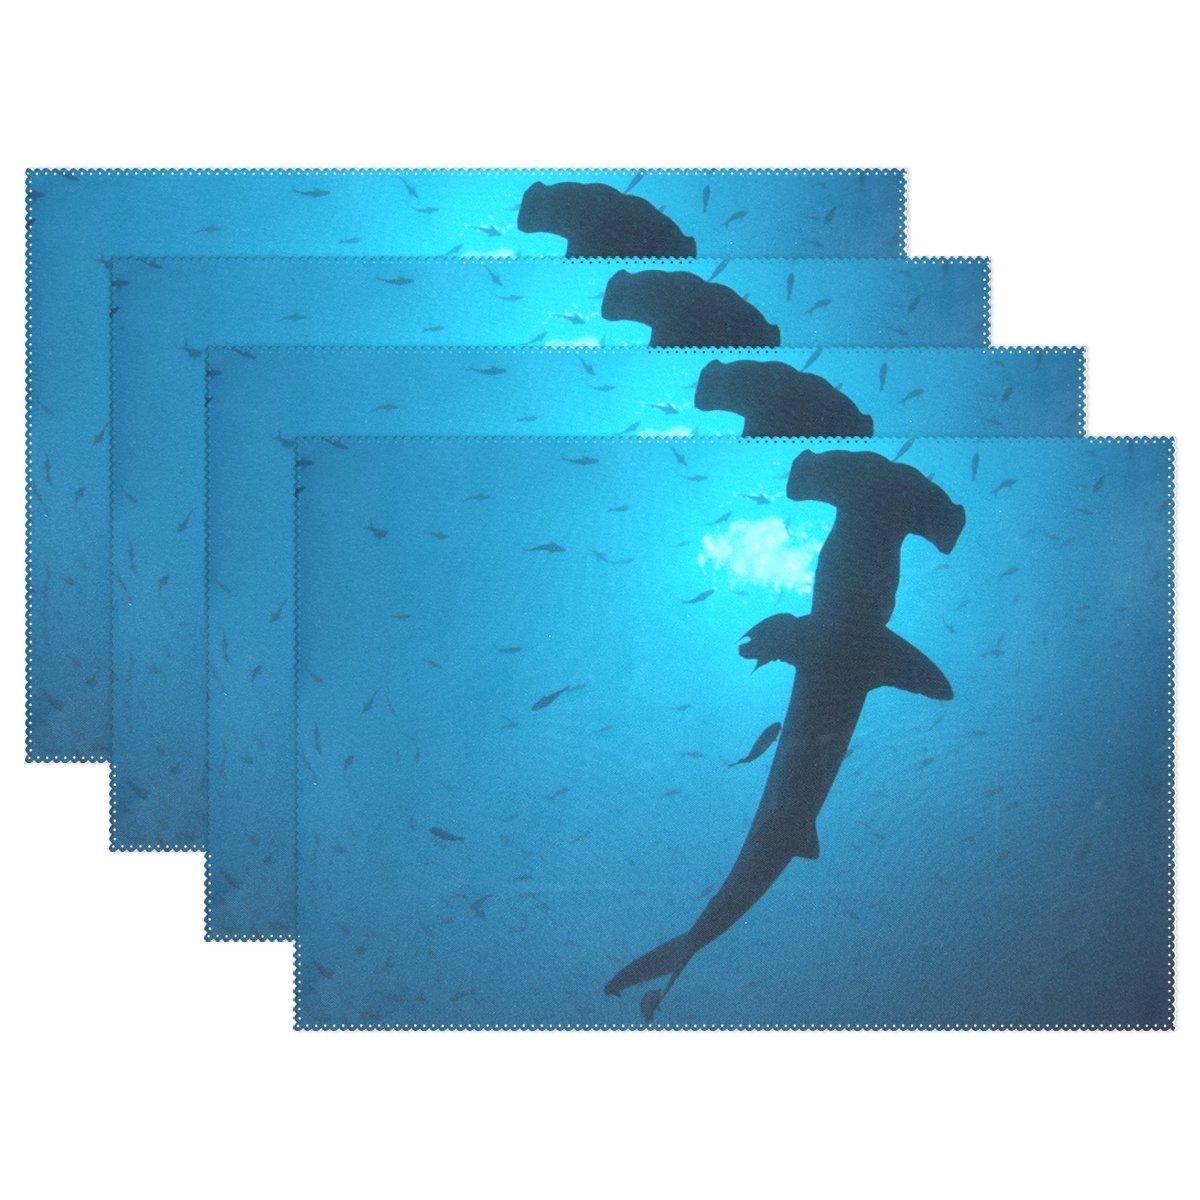 Ethel Ernest Cool Scalloped Hammerhead Sharks Underwater耐熱プレースマット、ポリエステルテーブルマットPlace Mat forキッチンダイニングルーム1 Piece 12x18x6 in 6  B076586PLL